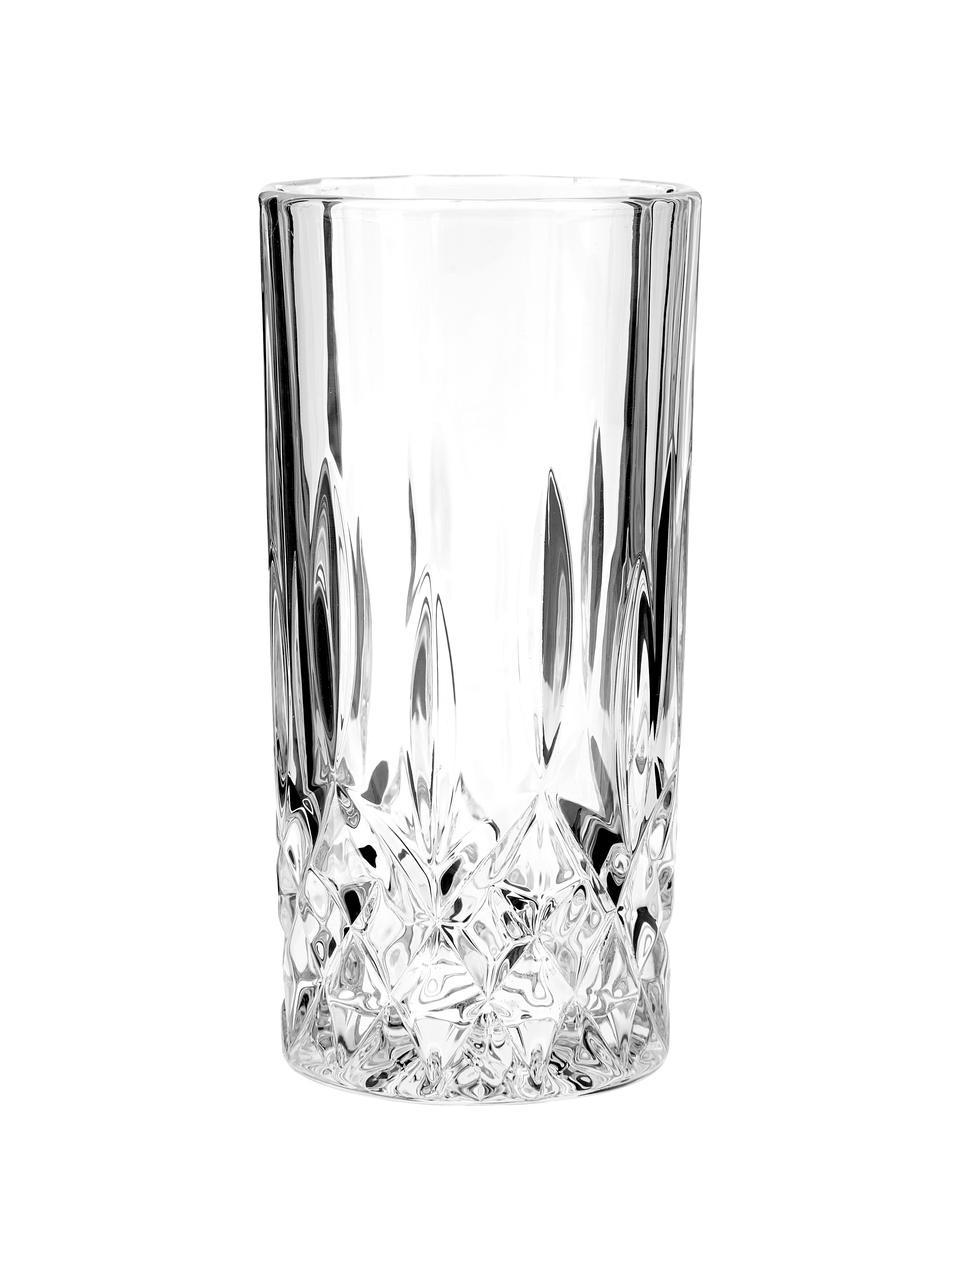 Longdrinkglazen George met kristalreliëf, 4 stuks, Glas, Transparant, Ø 8 x H 15 cm